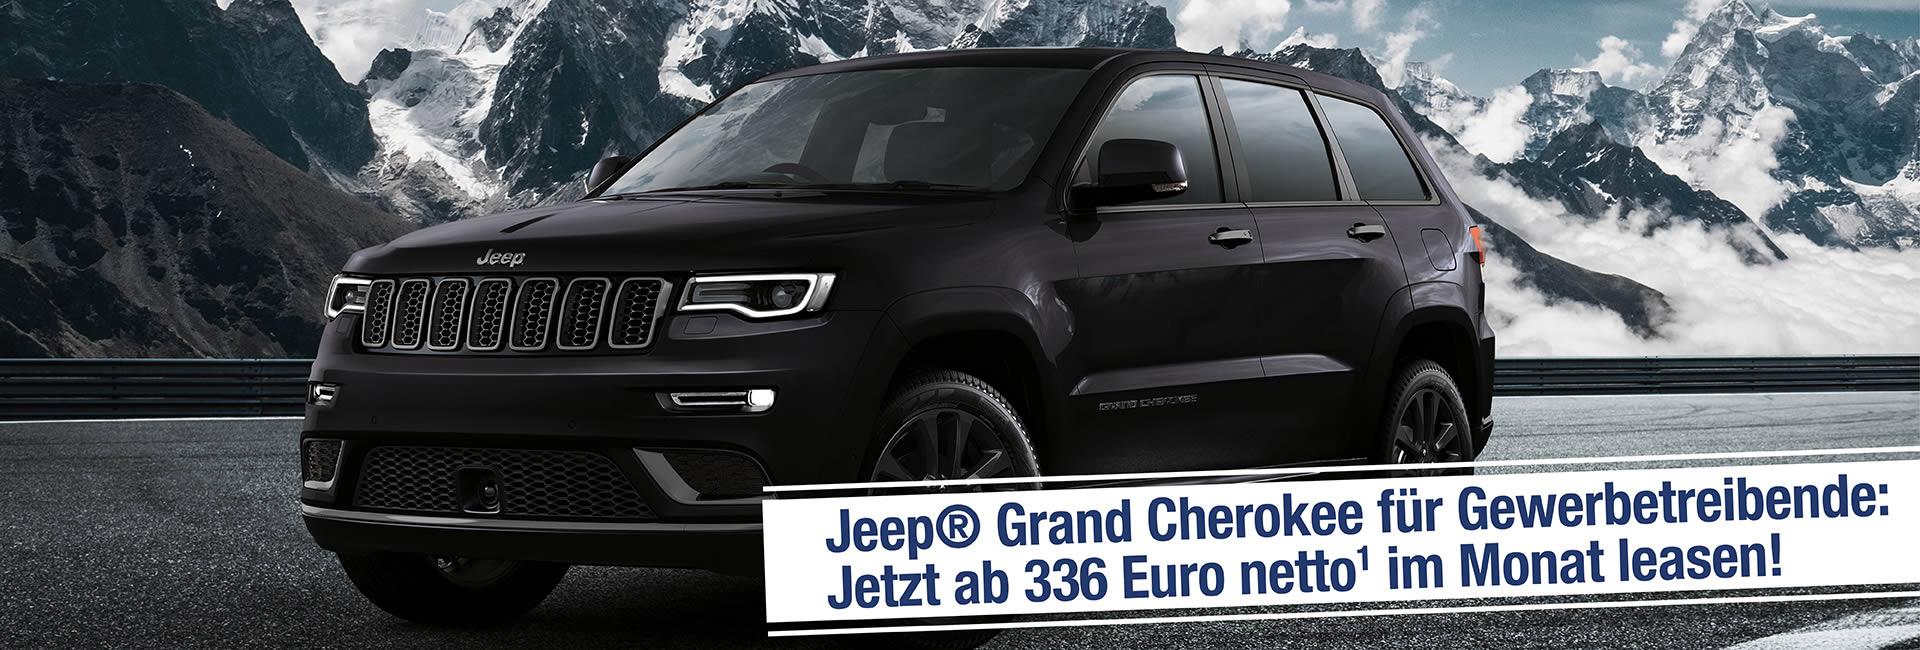 Slider – Jeep Grand Cherokee Leasing Angebot Autohaus Mayrhoermann GmbH in Augsburg – Diedorf